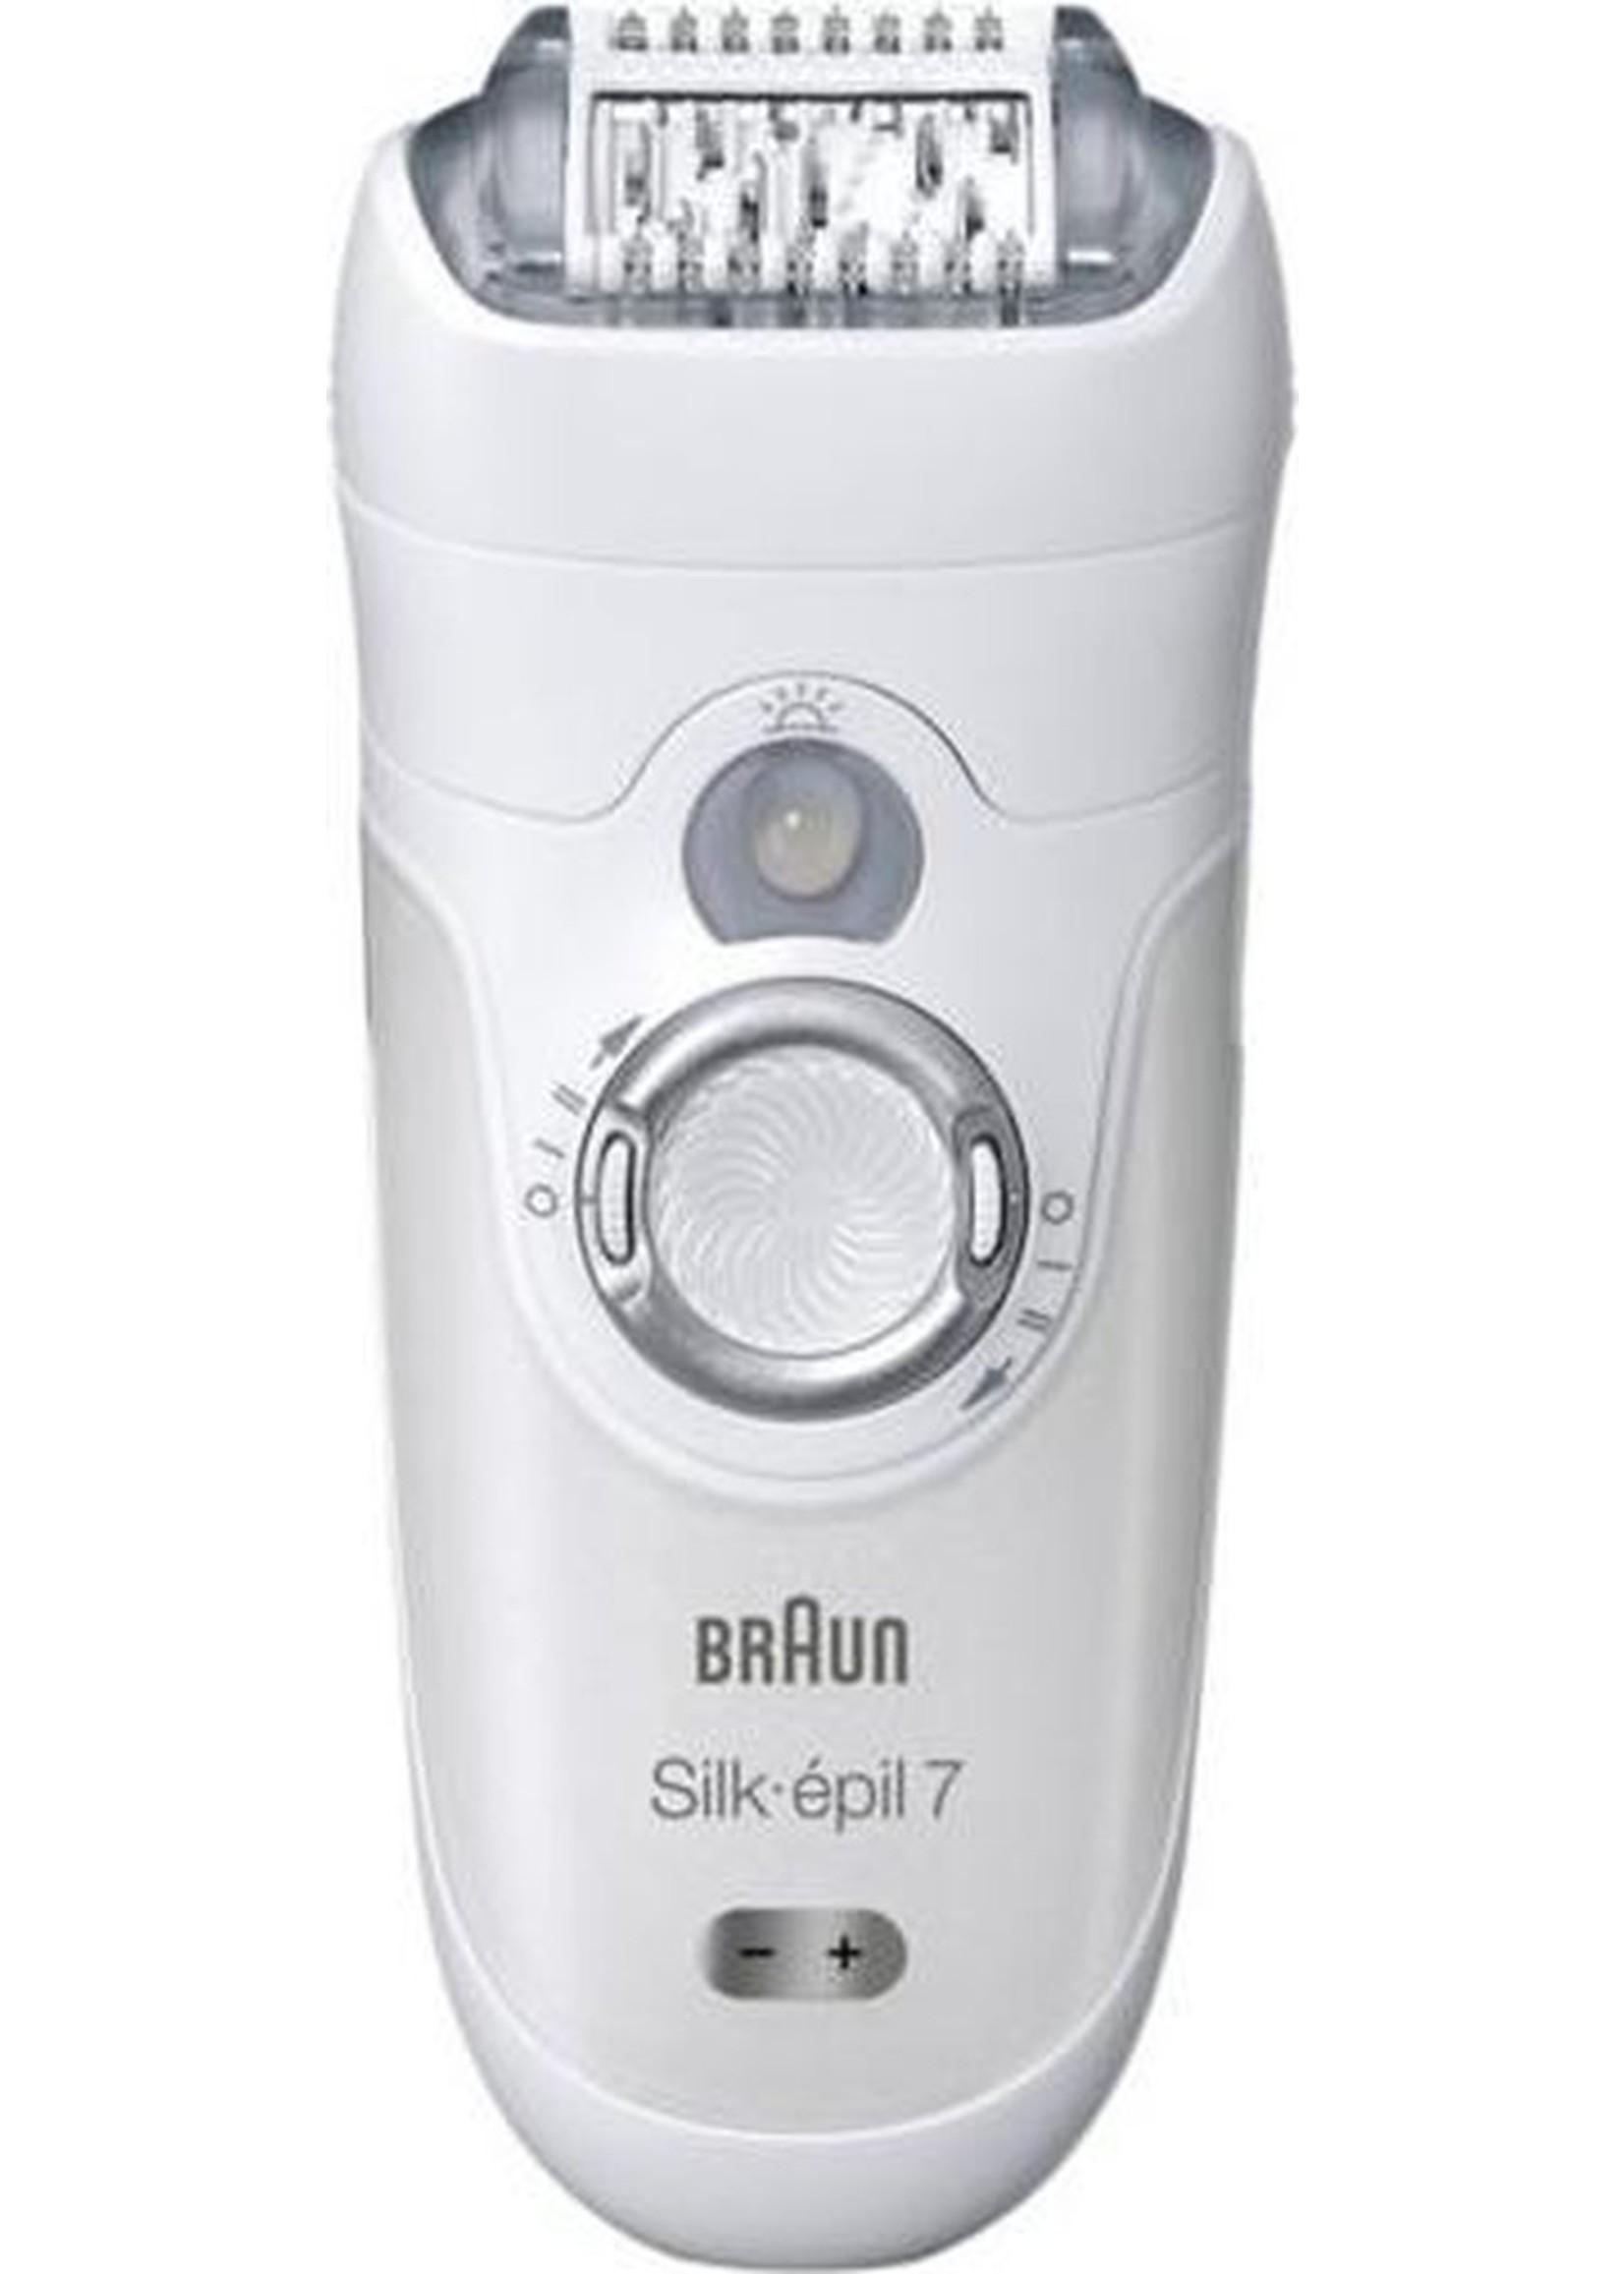 Braun Braun Silk-épil 7-561 - koopjeshoek